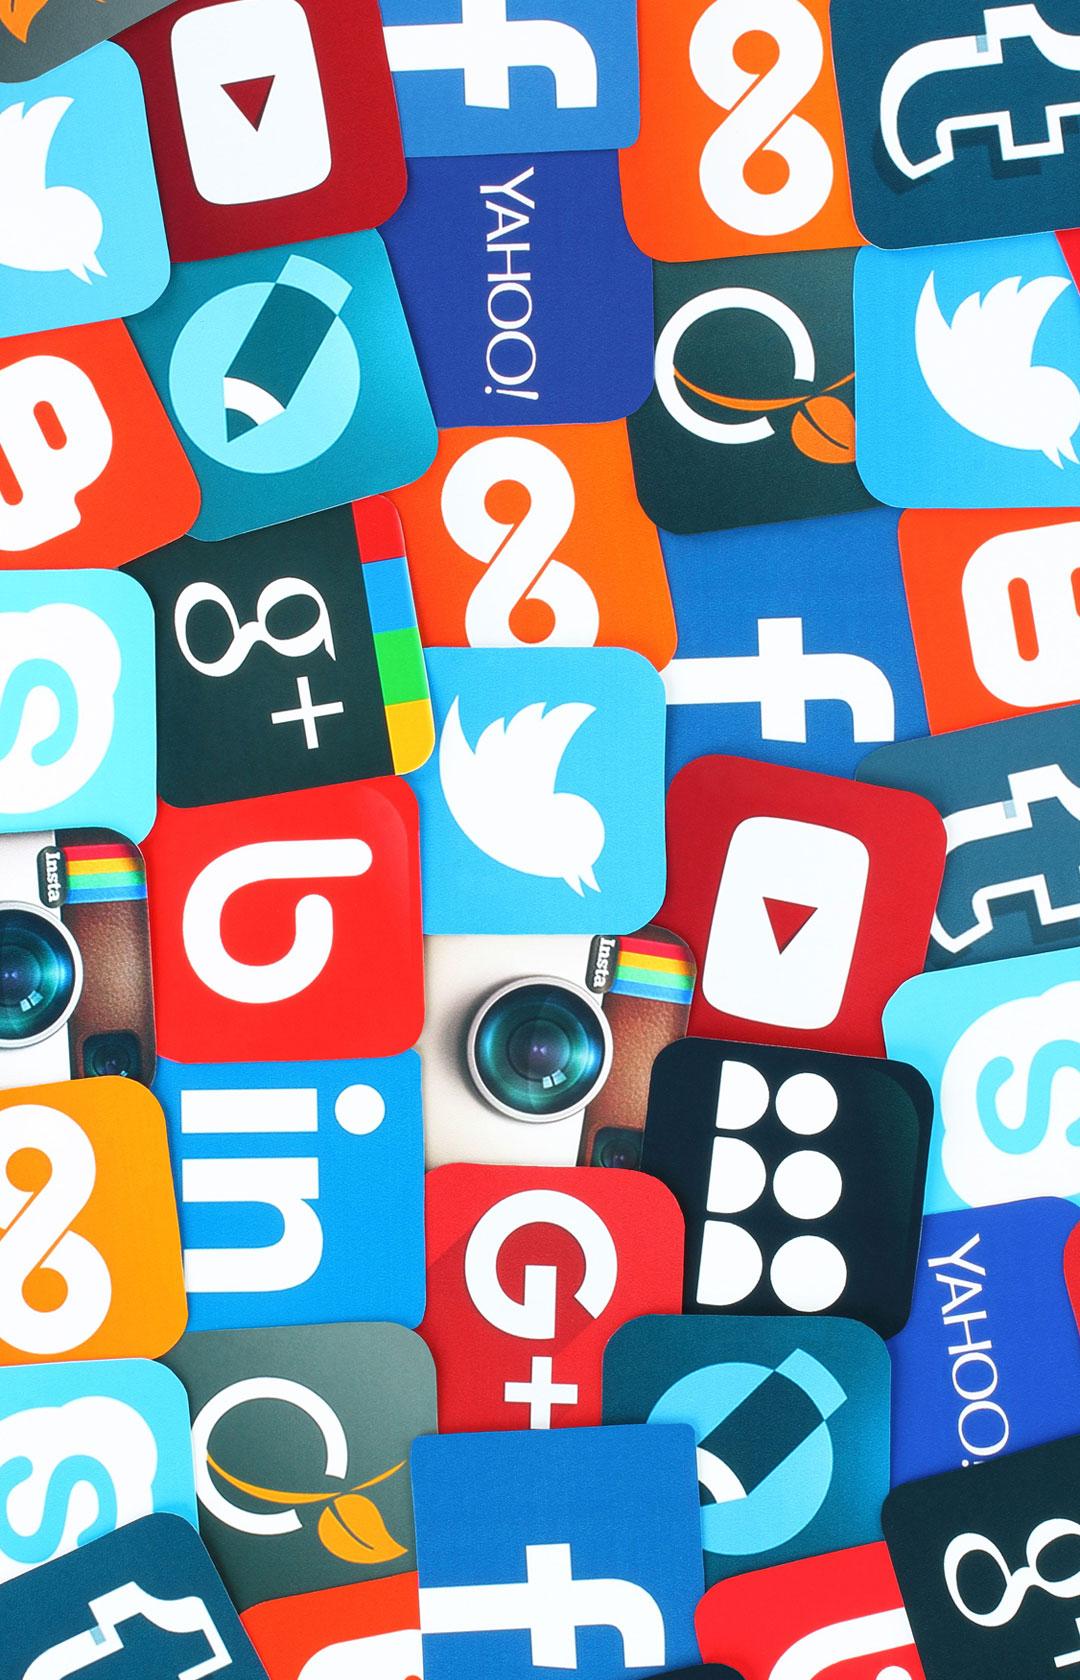 seo-social-services-image-mci